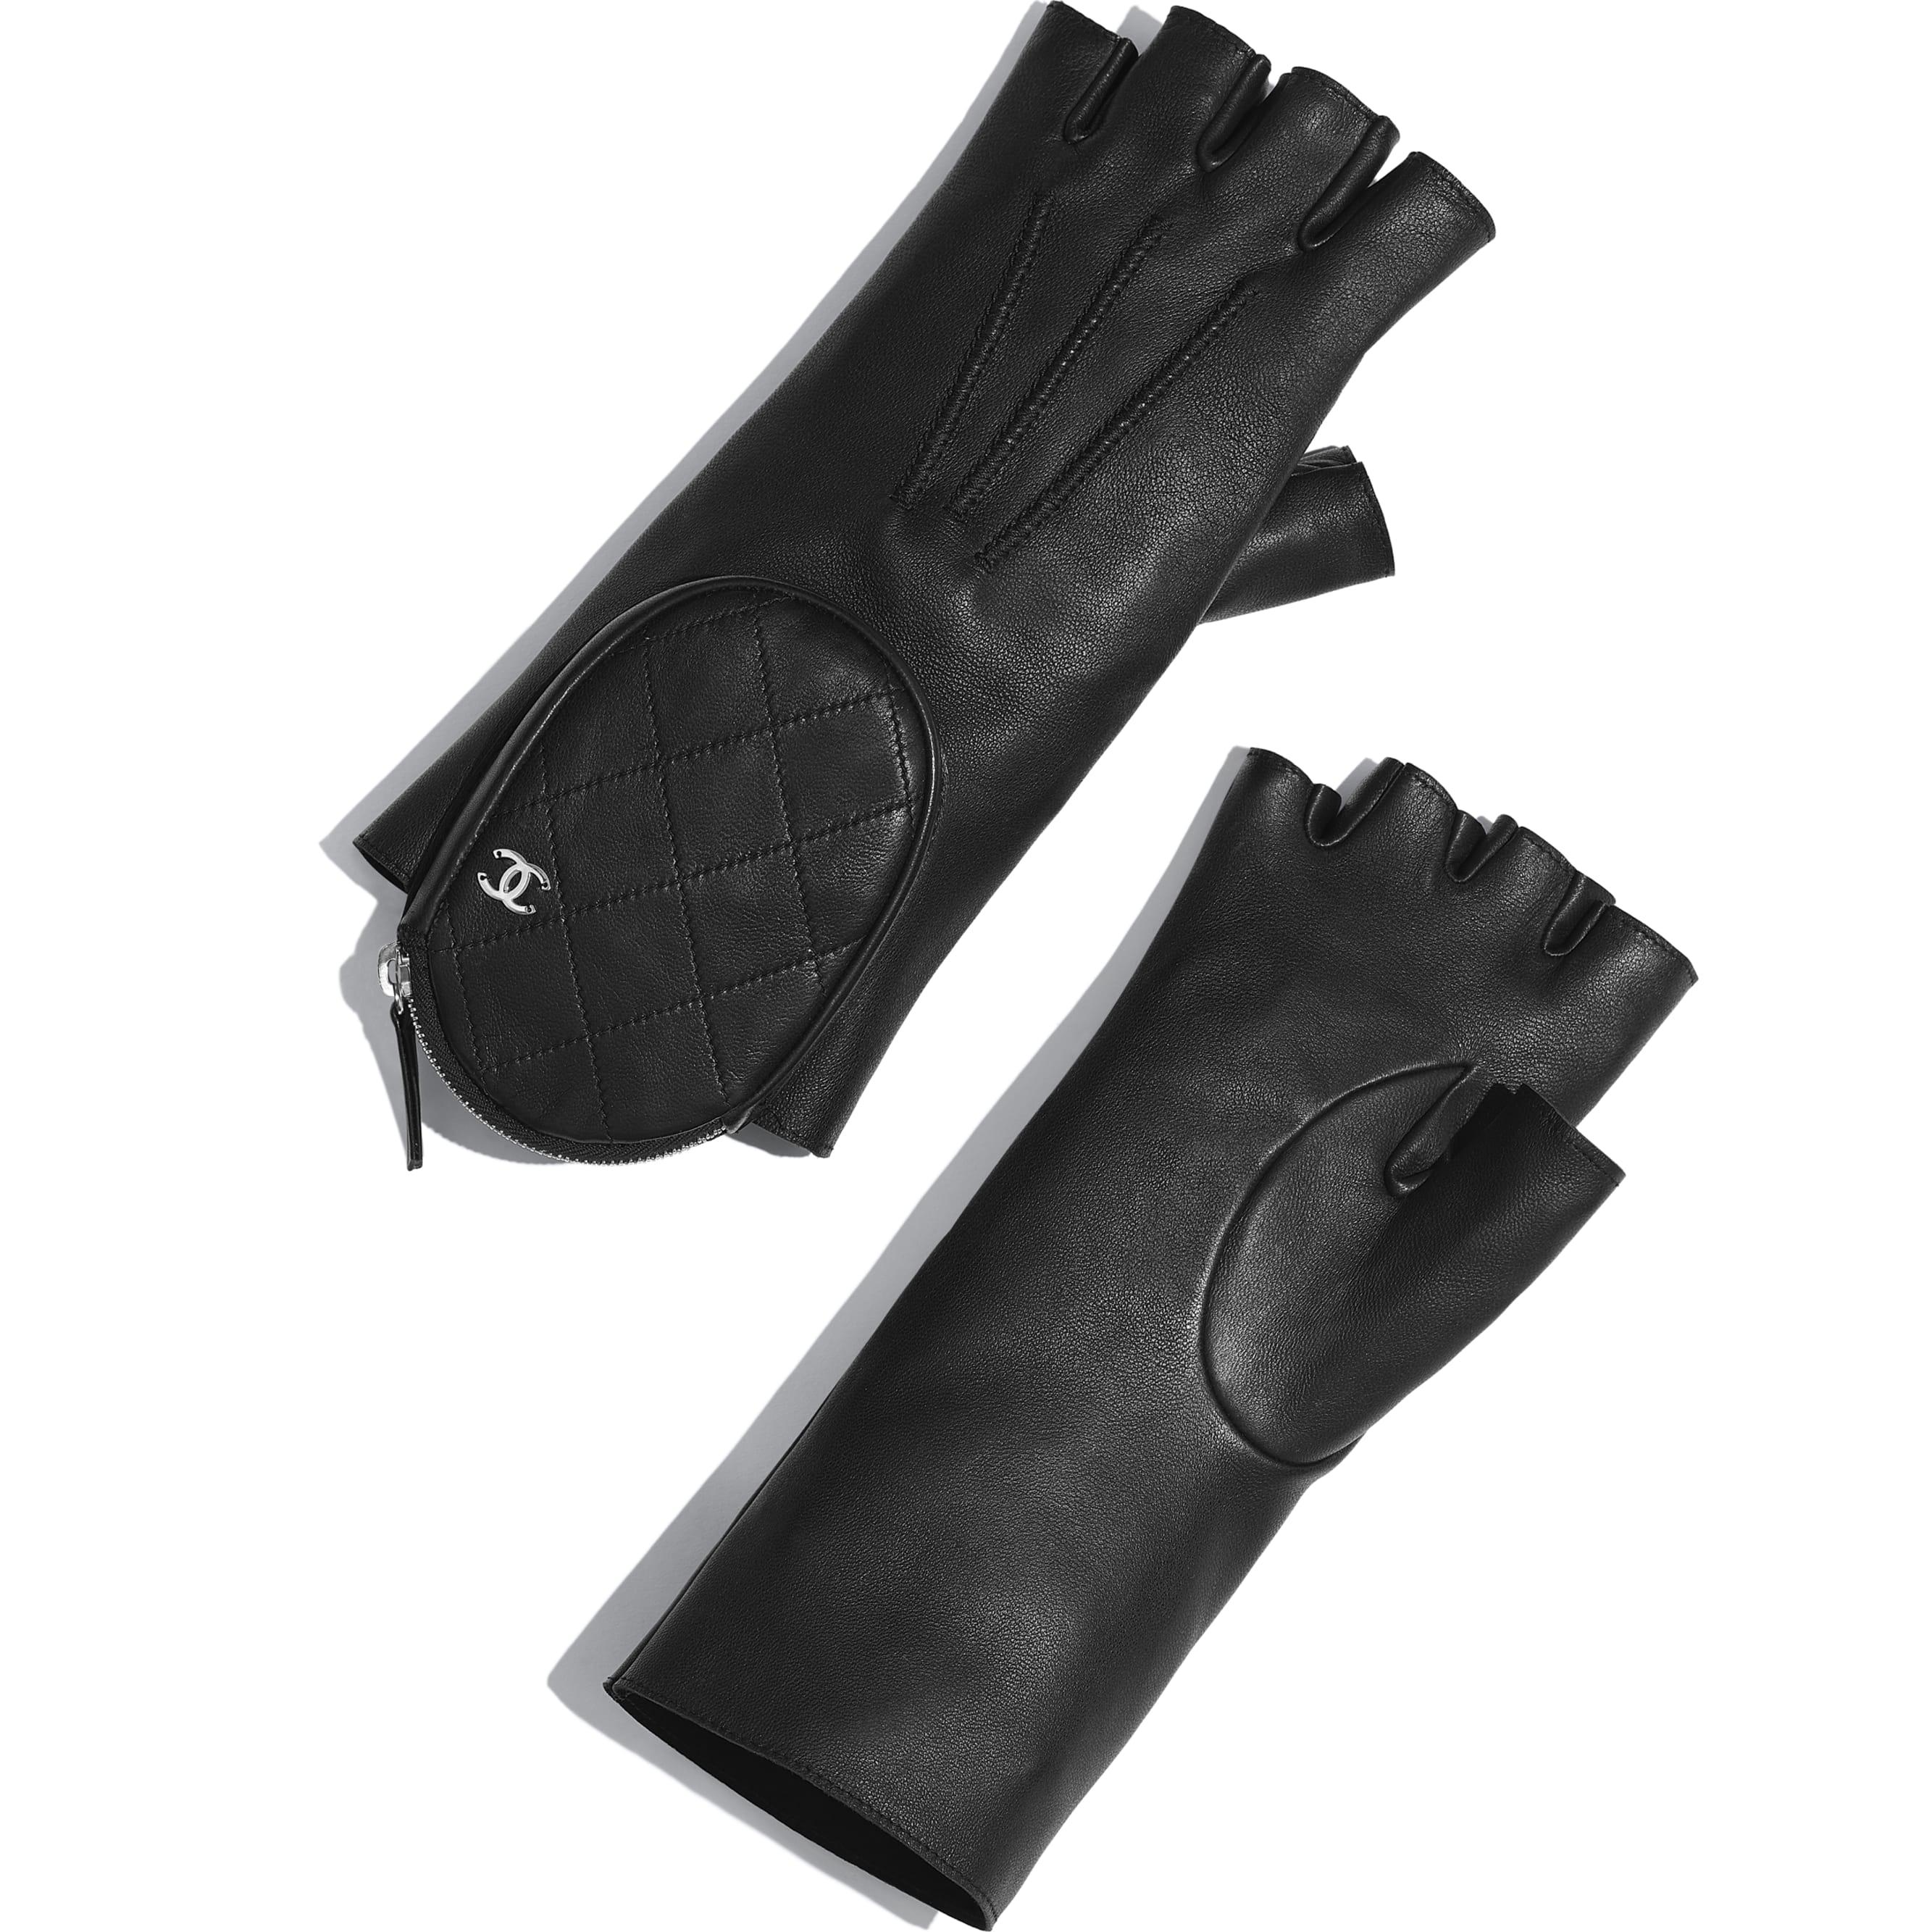 Gloves - Black - Lambskin & Silver-Tone Metal - Default view - see standard sized version